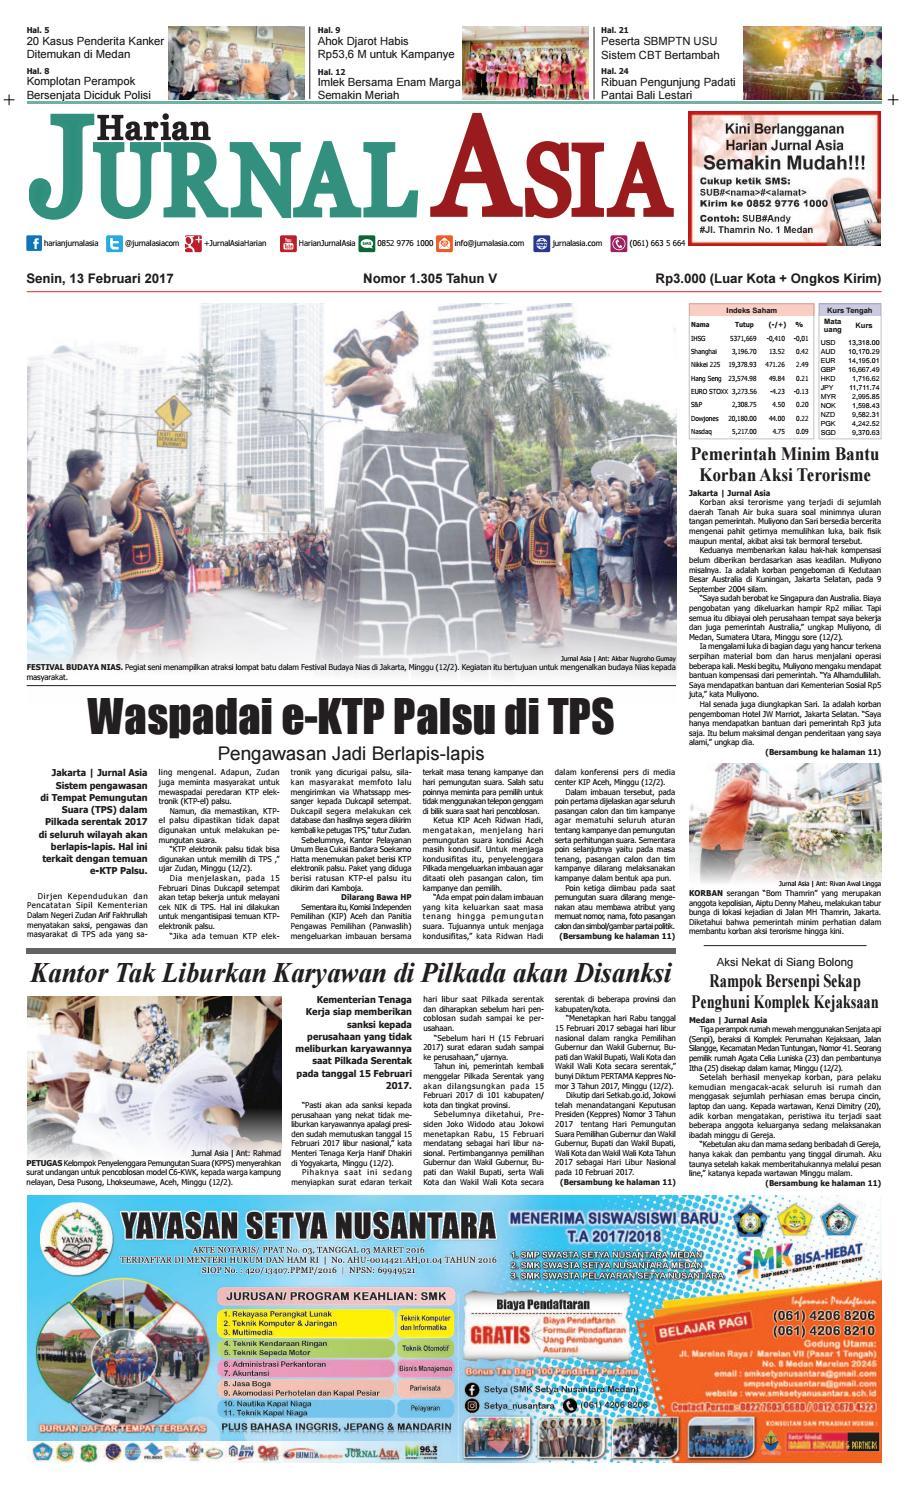 Harian Jurnal Asia Edisi Senin 13 Februari 2017 By Produk Ukm Bumn Susu Kambing Etawa Instant Medan Issuu